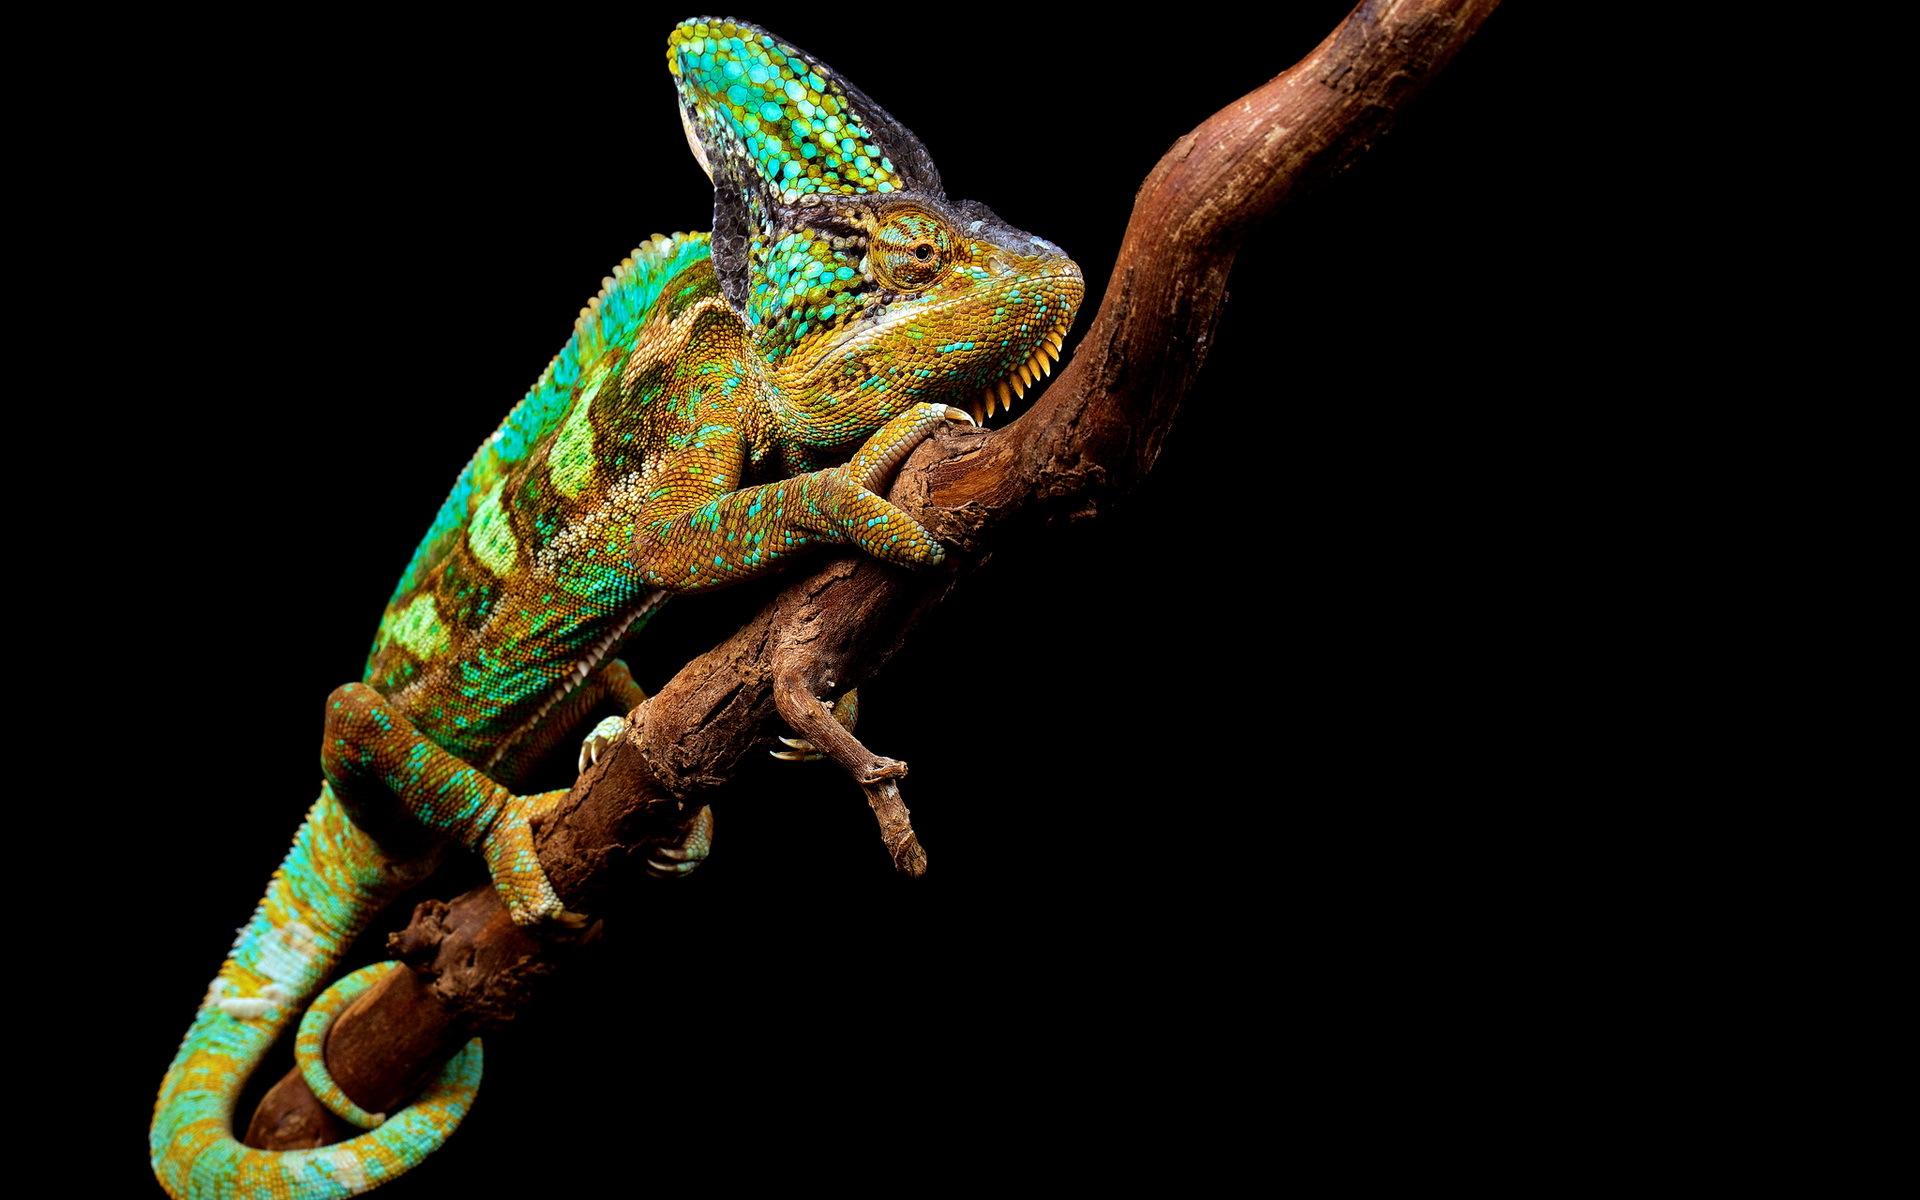 colorful chameleon 34523